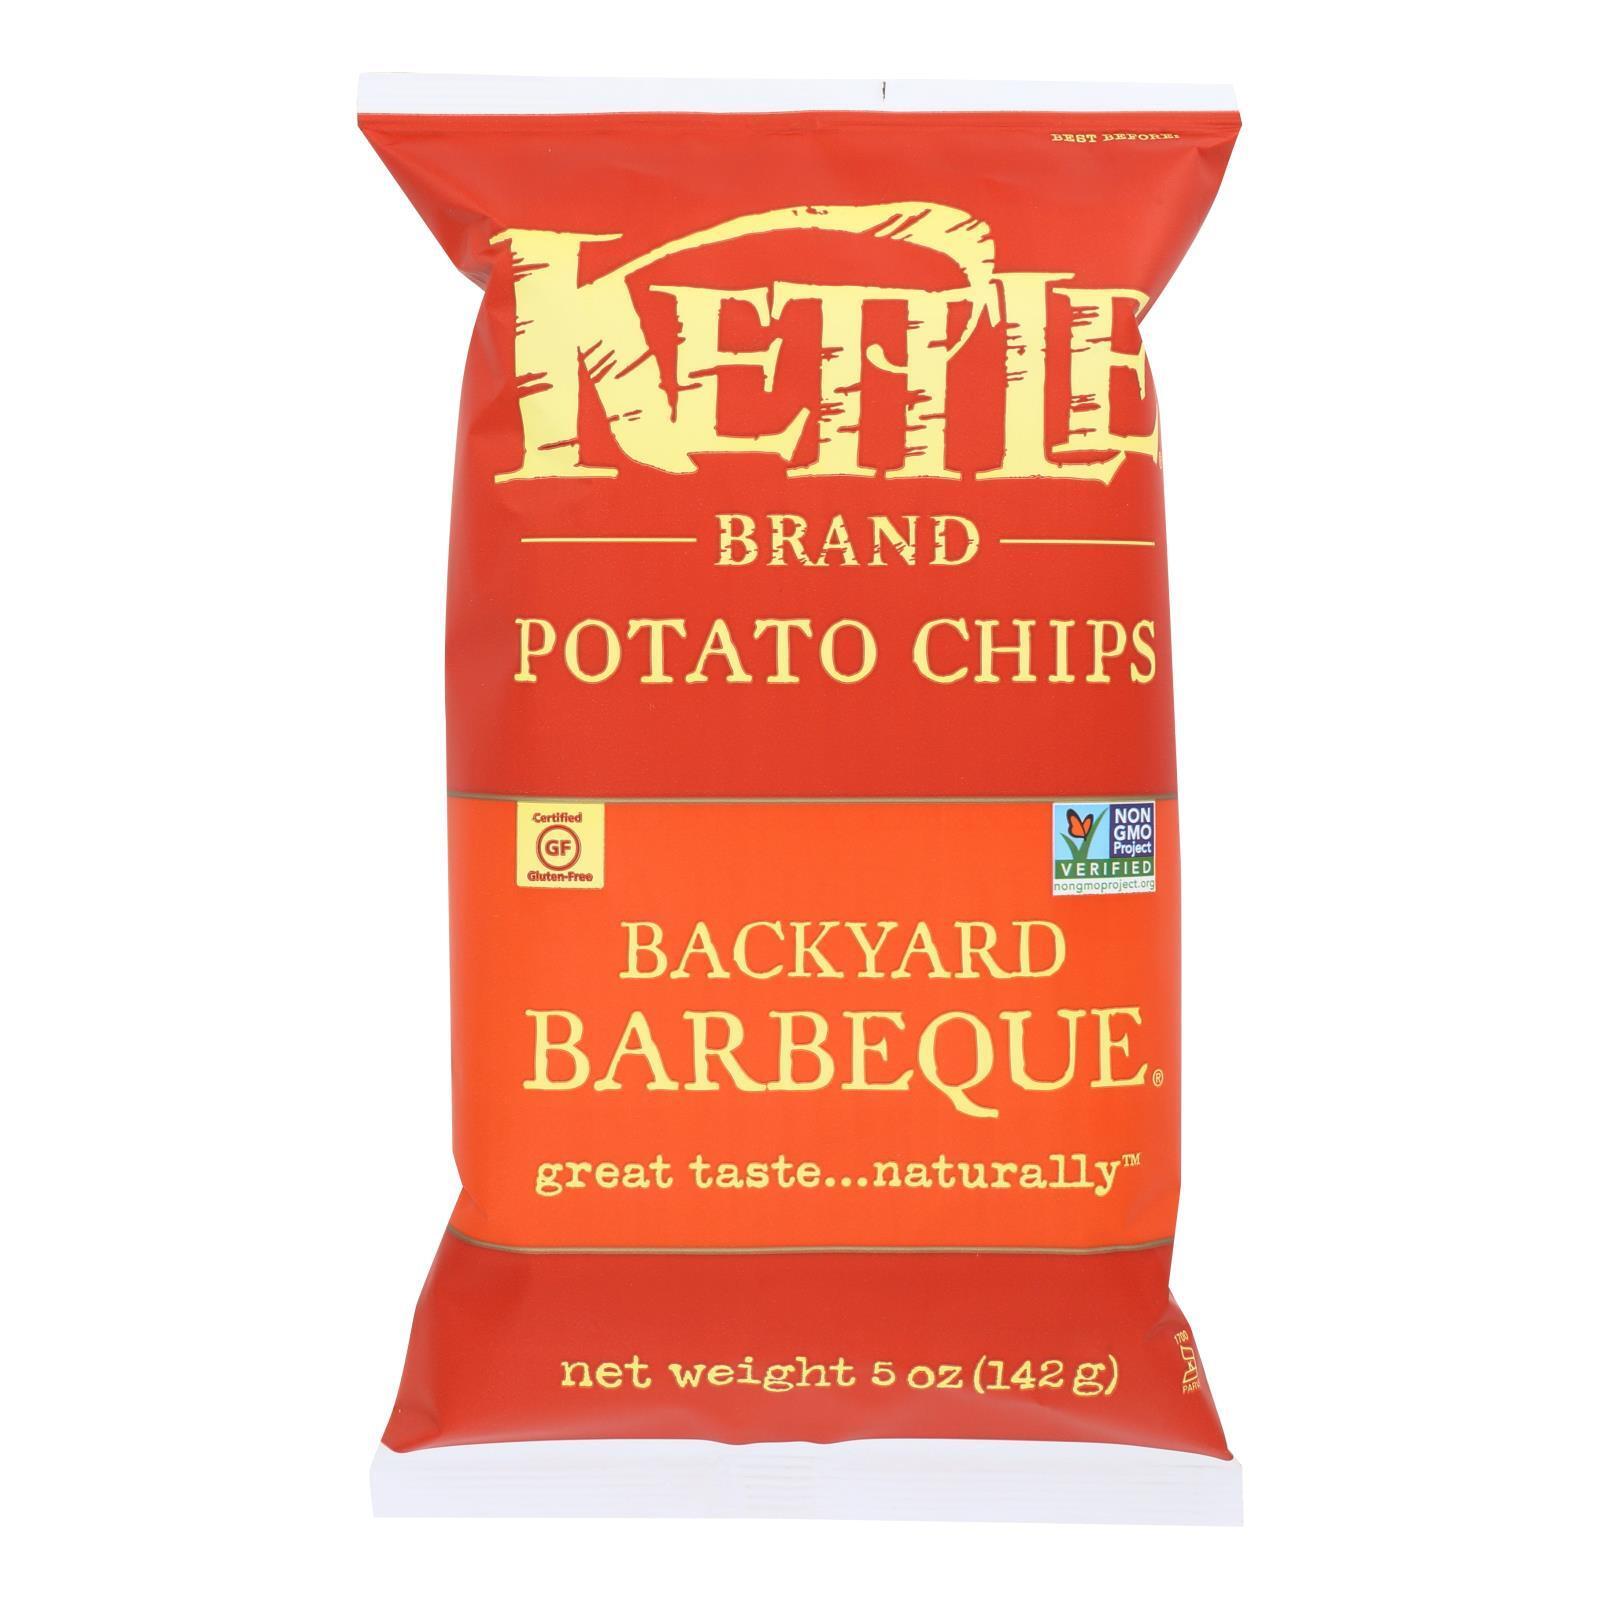 Kettle Brand Potato Chips - Backyard Barbeque - Case of 15 - 5 oz.